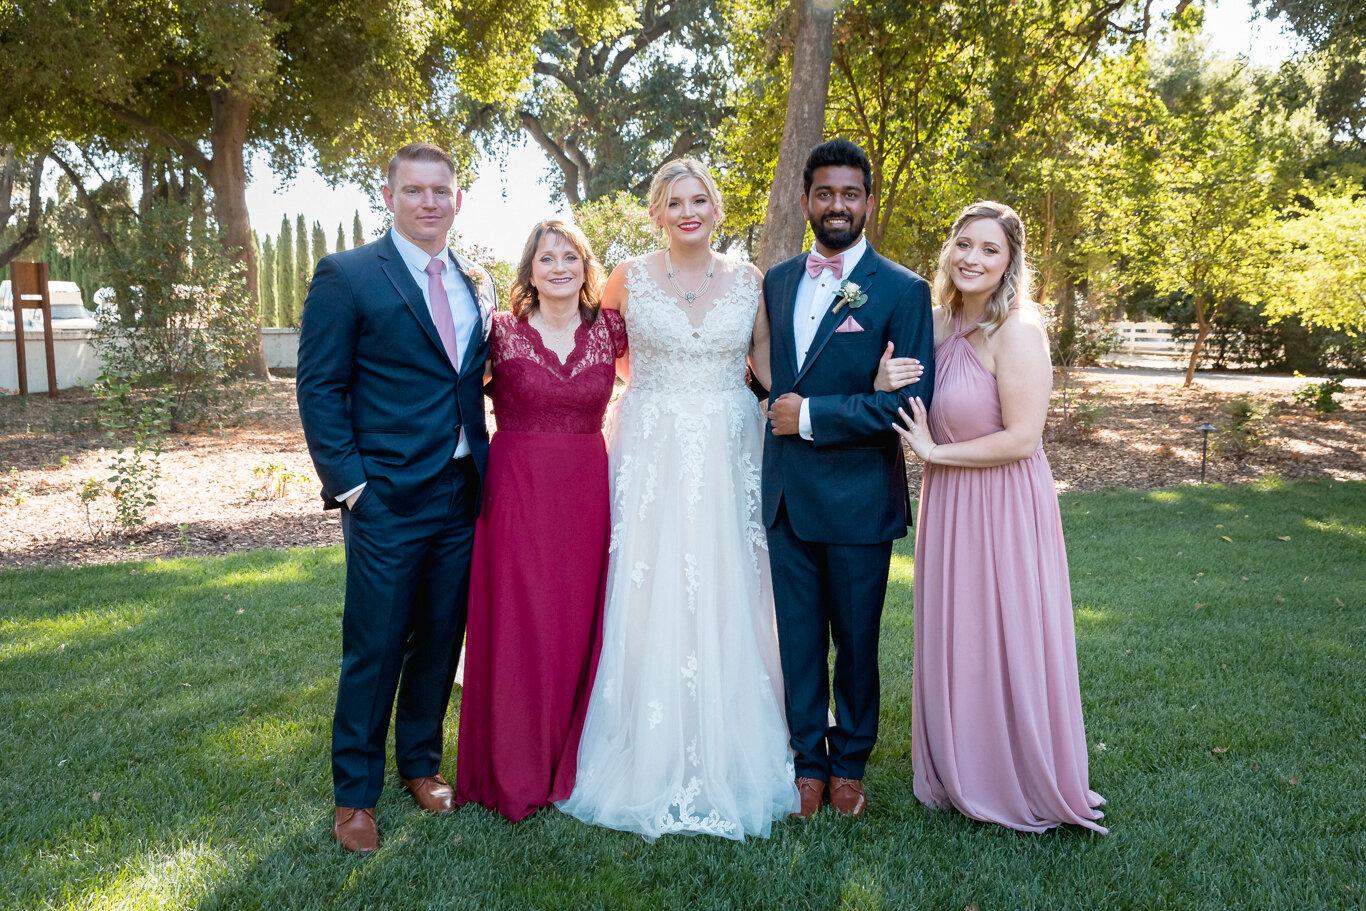 2019.08.24_Emily-Ashir-Wedding-at-the-Maples-5510.jpg